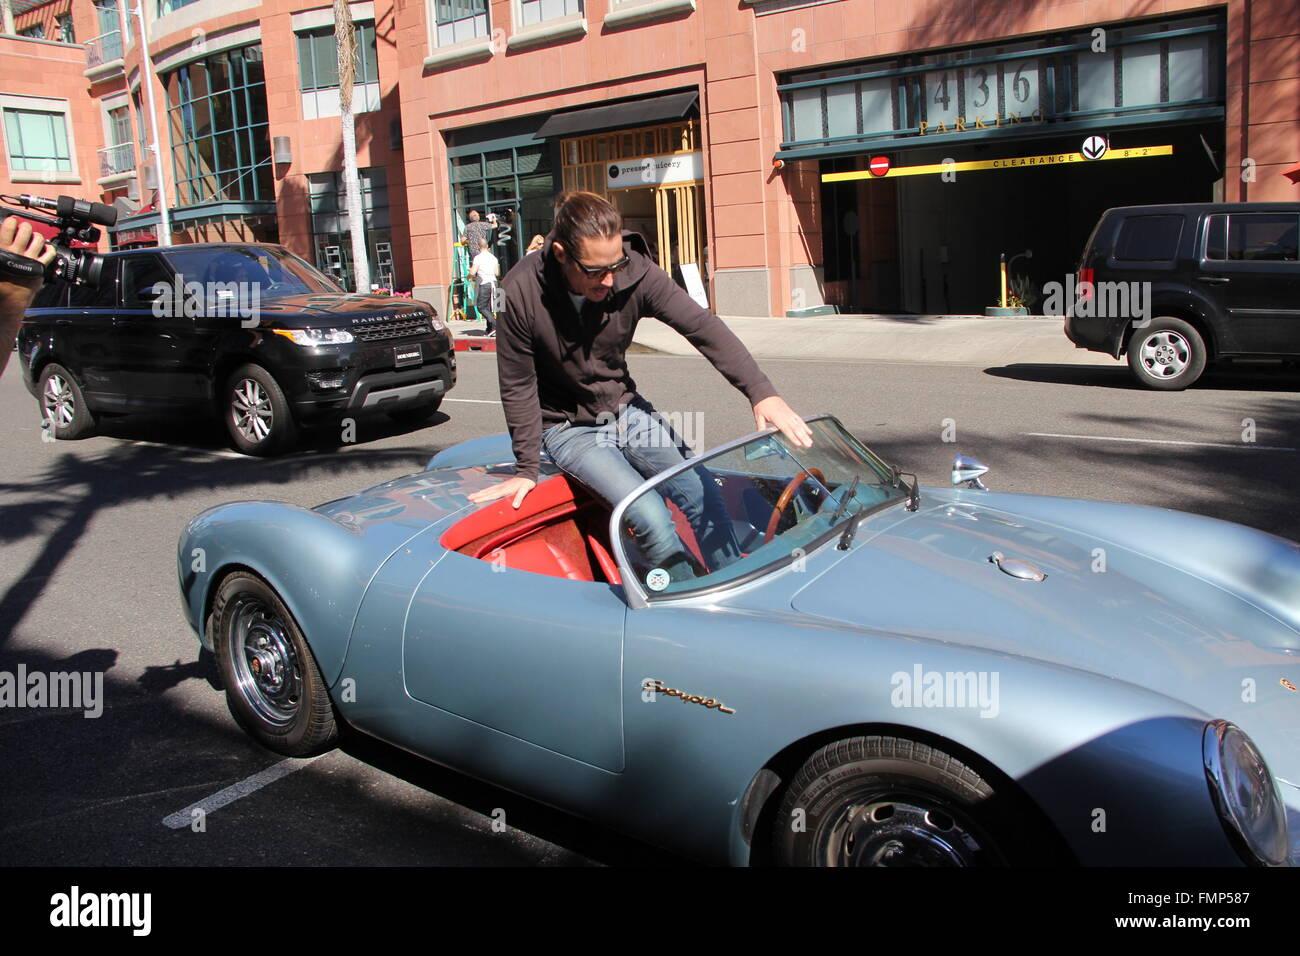 Chris Cornell Jumps Into His Vintage 1955 Porsche Speedster Spyder The Same Model James Dean Drove Featuring Where Beverly Hills